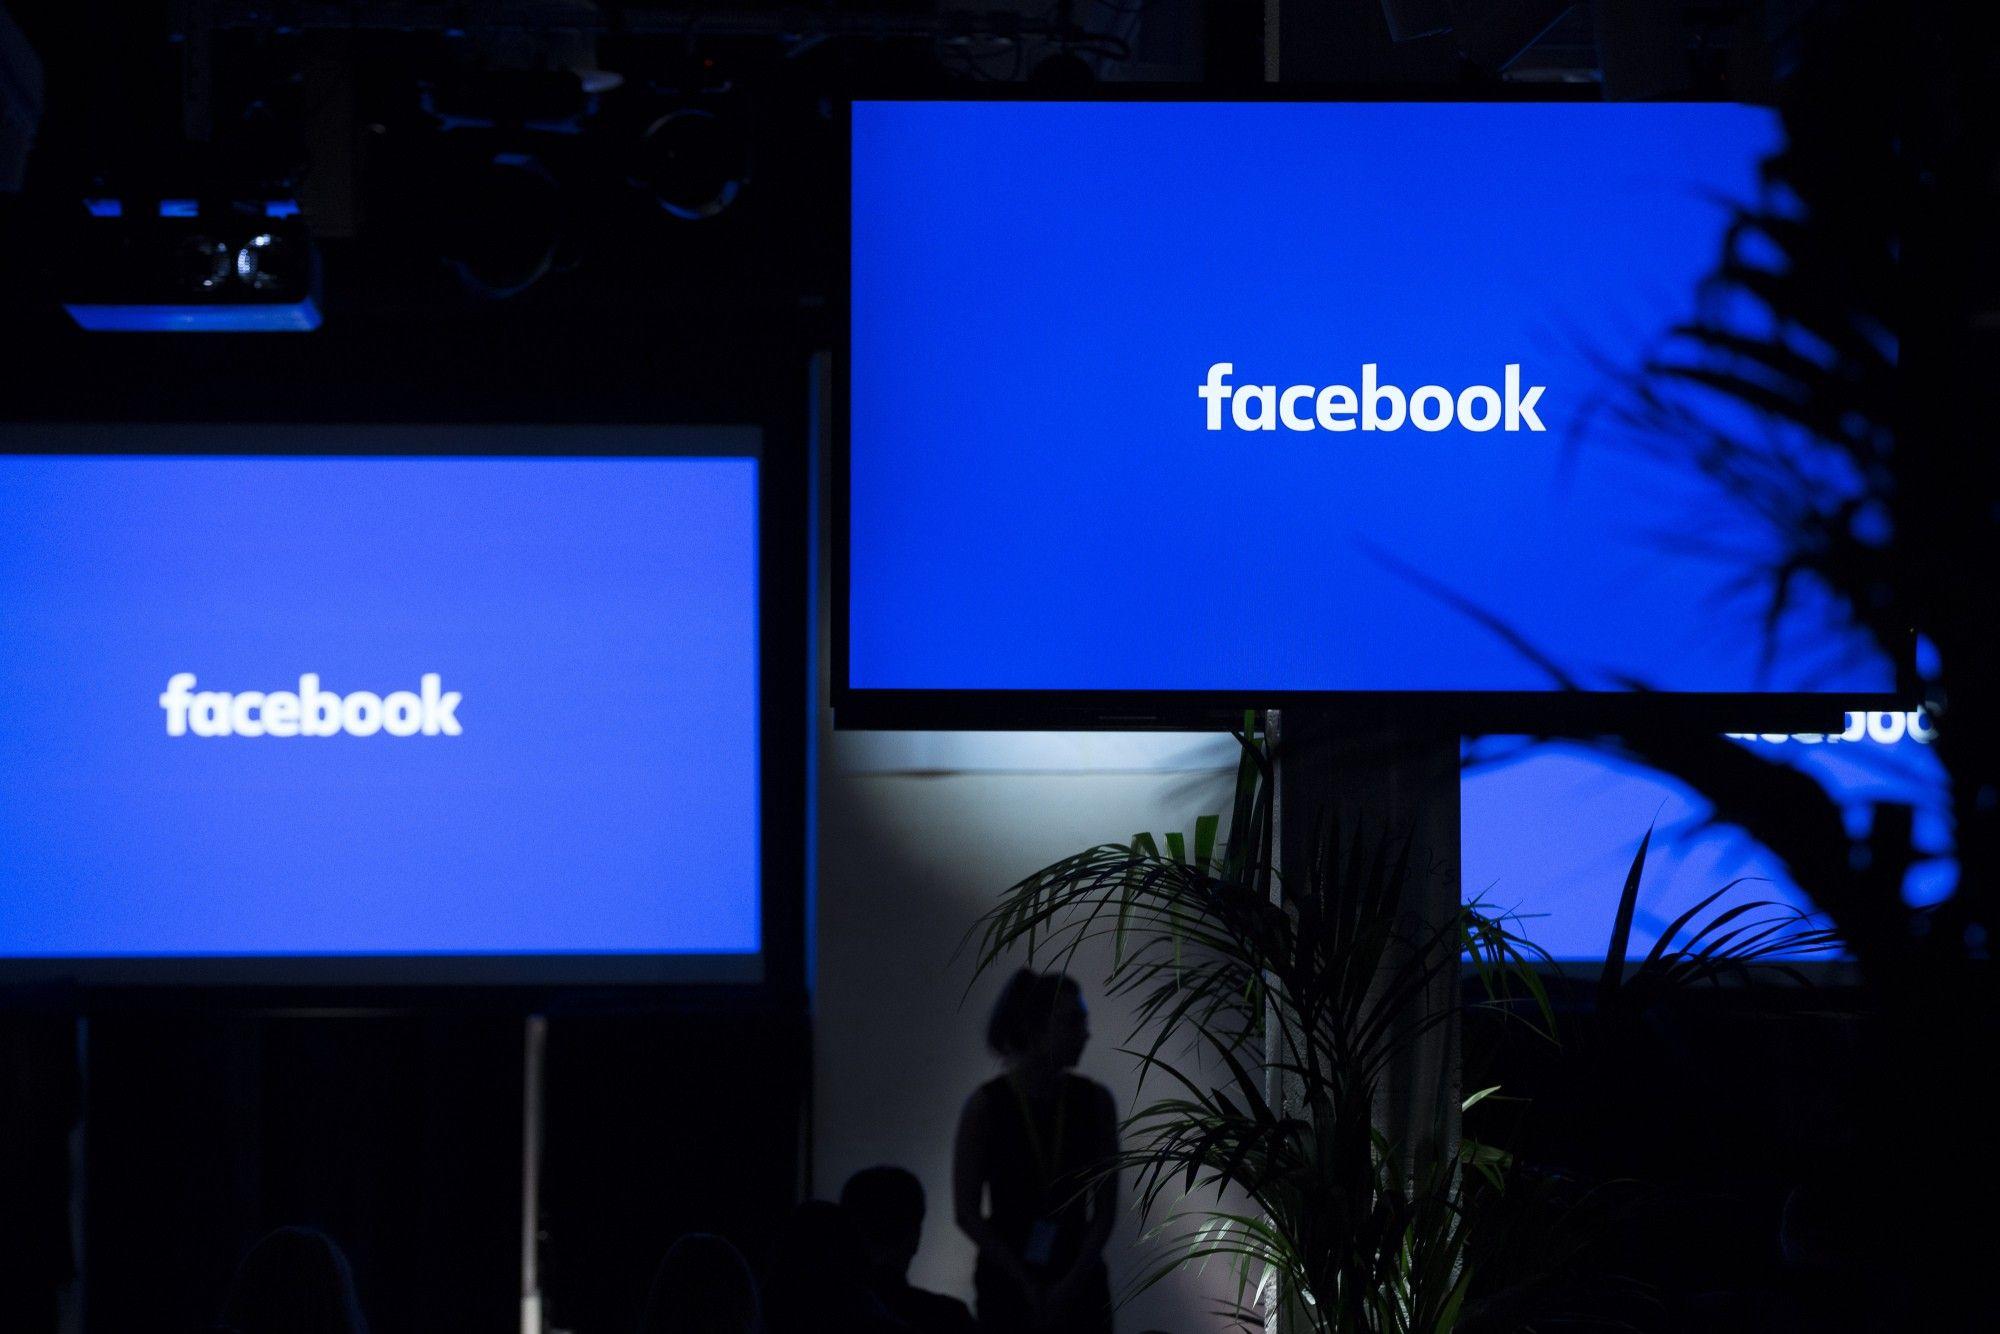 Facebook Inc. Launches Facebook At Work